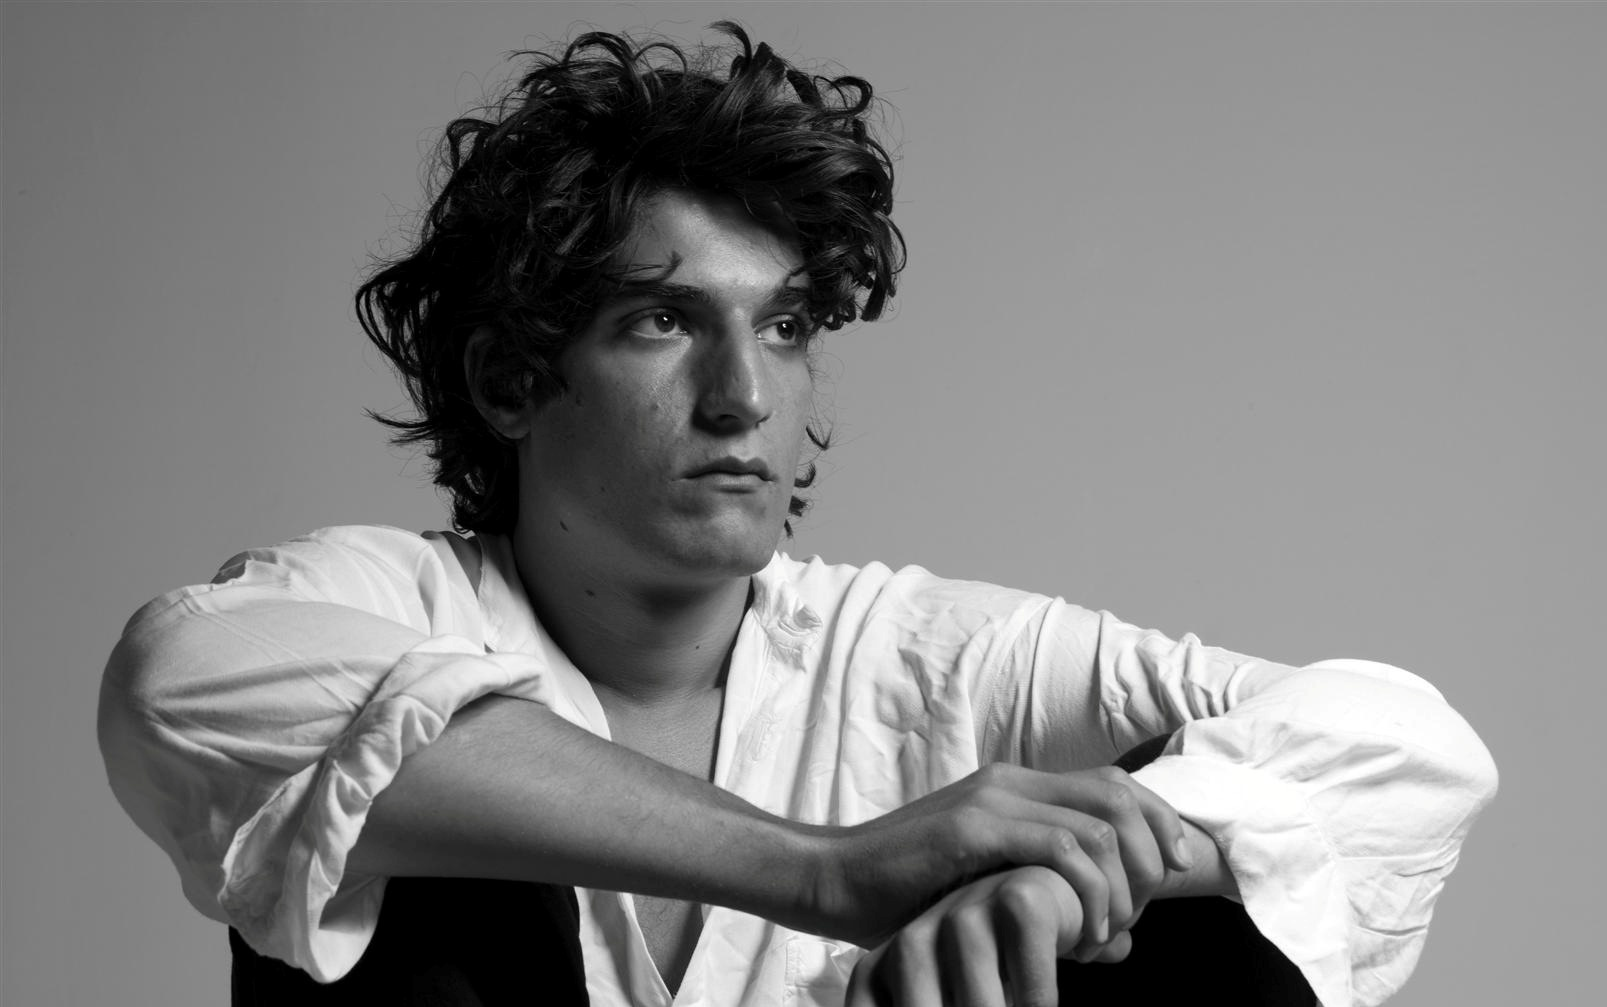 Arte: Louis Garrel, o ator-fetiche do cinema francês